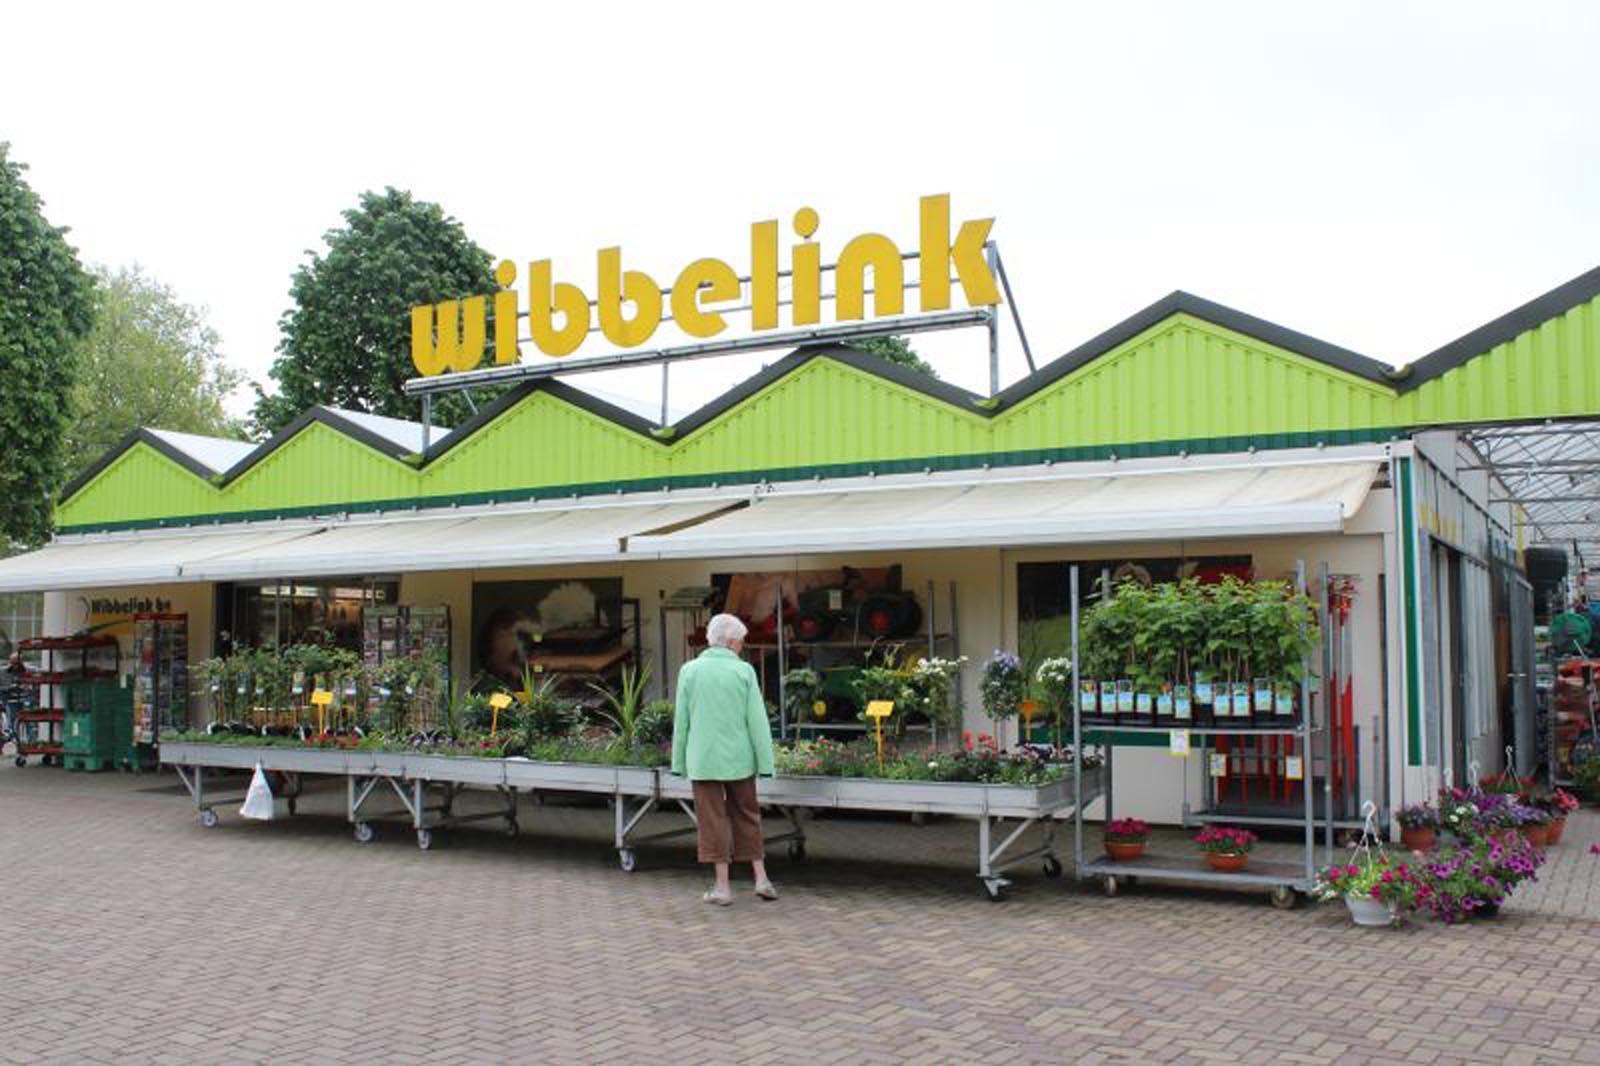 Wibbelink – Uw groene vakwinkel